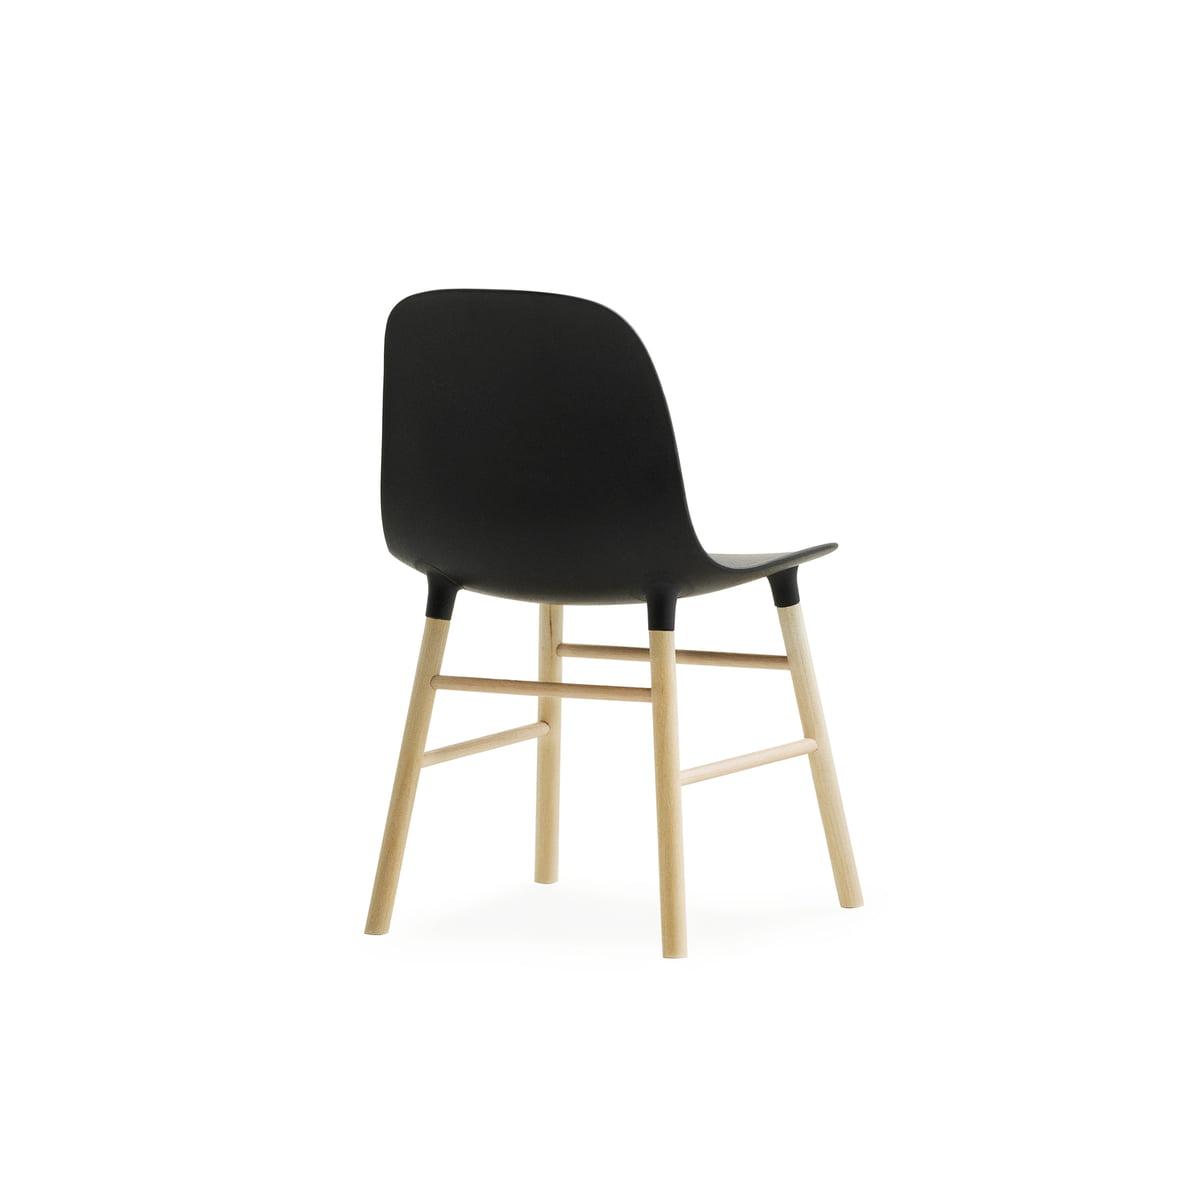 form chair miniature by normann copenhagen. Black Bedroom Furniture Sets. Home Design Ideas